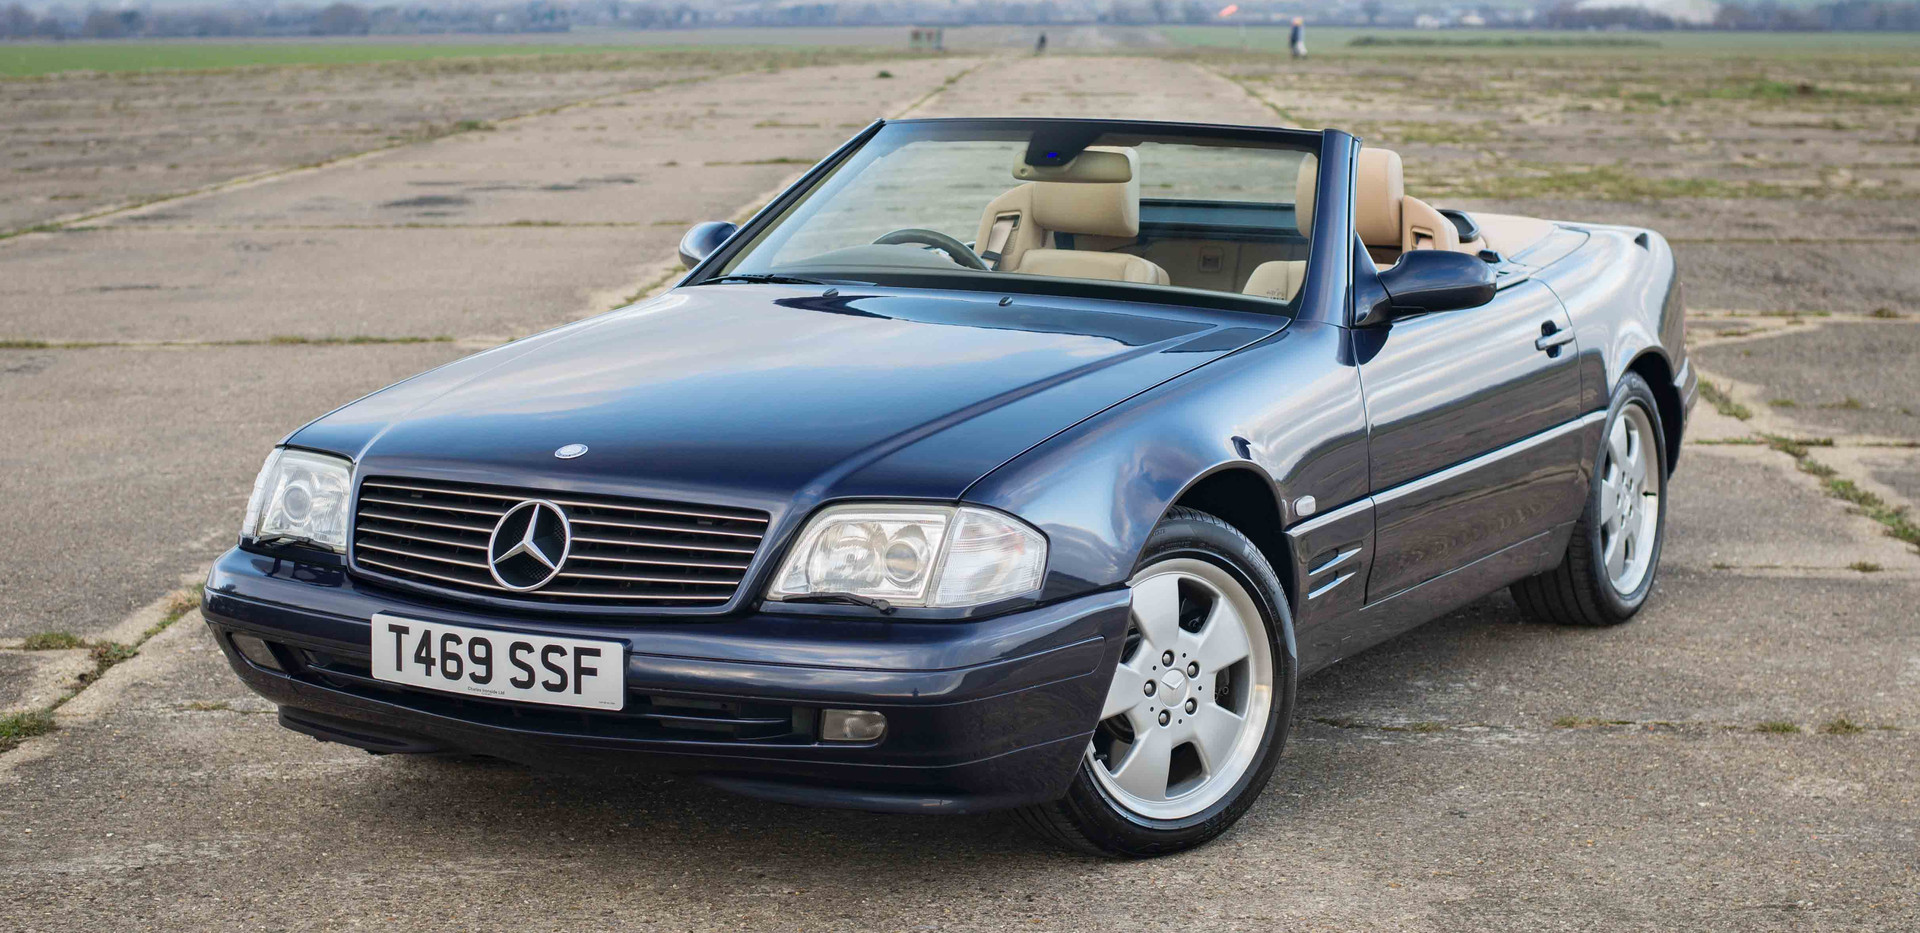 SL500 For Sale UK London  (5 of 36).jpg